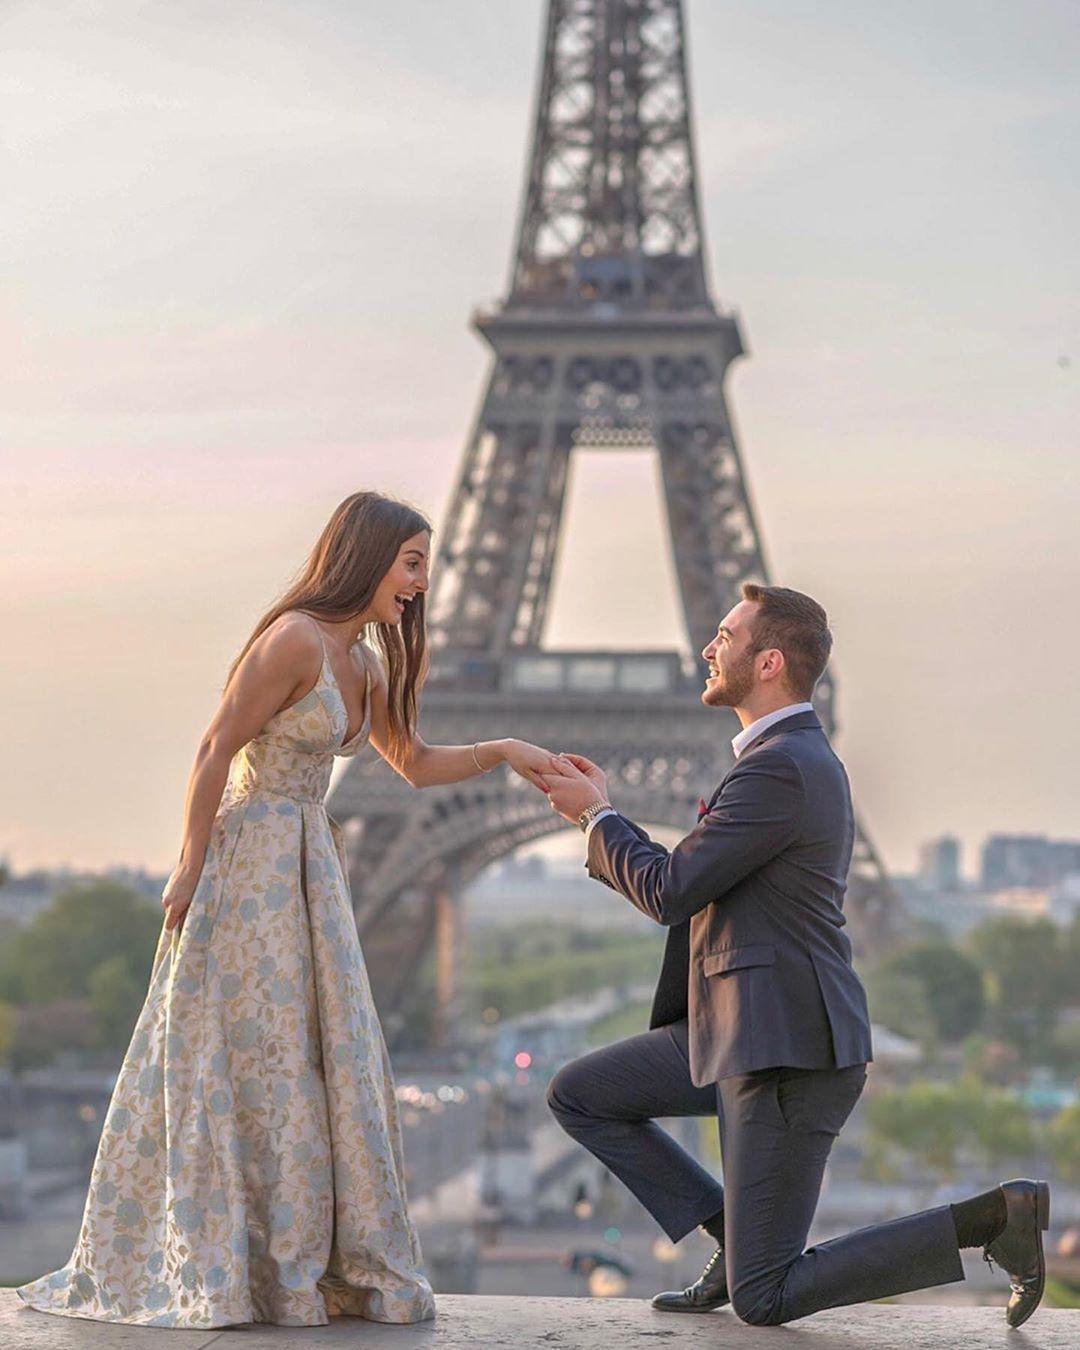 Wedding Proposal Wedding Proposals Romantic Proposal Proposal Engagement